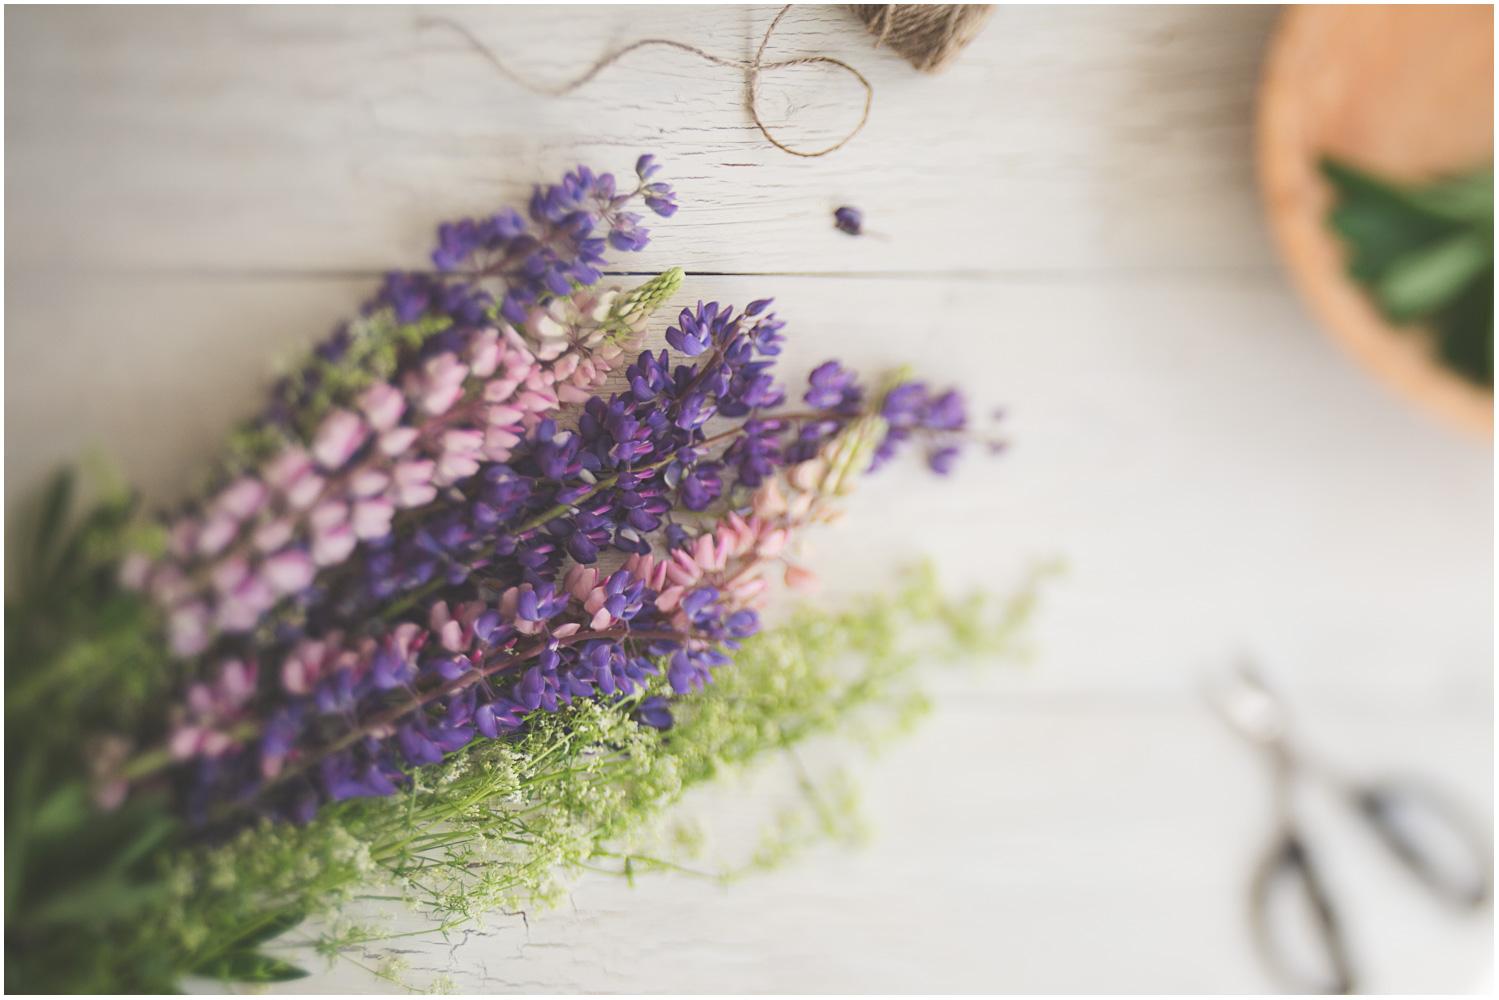 04_June_Flora_Lupine.jpg